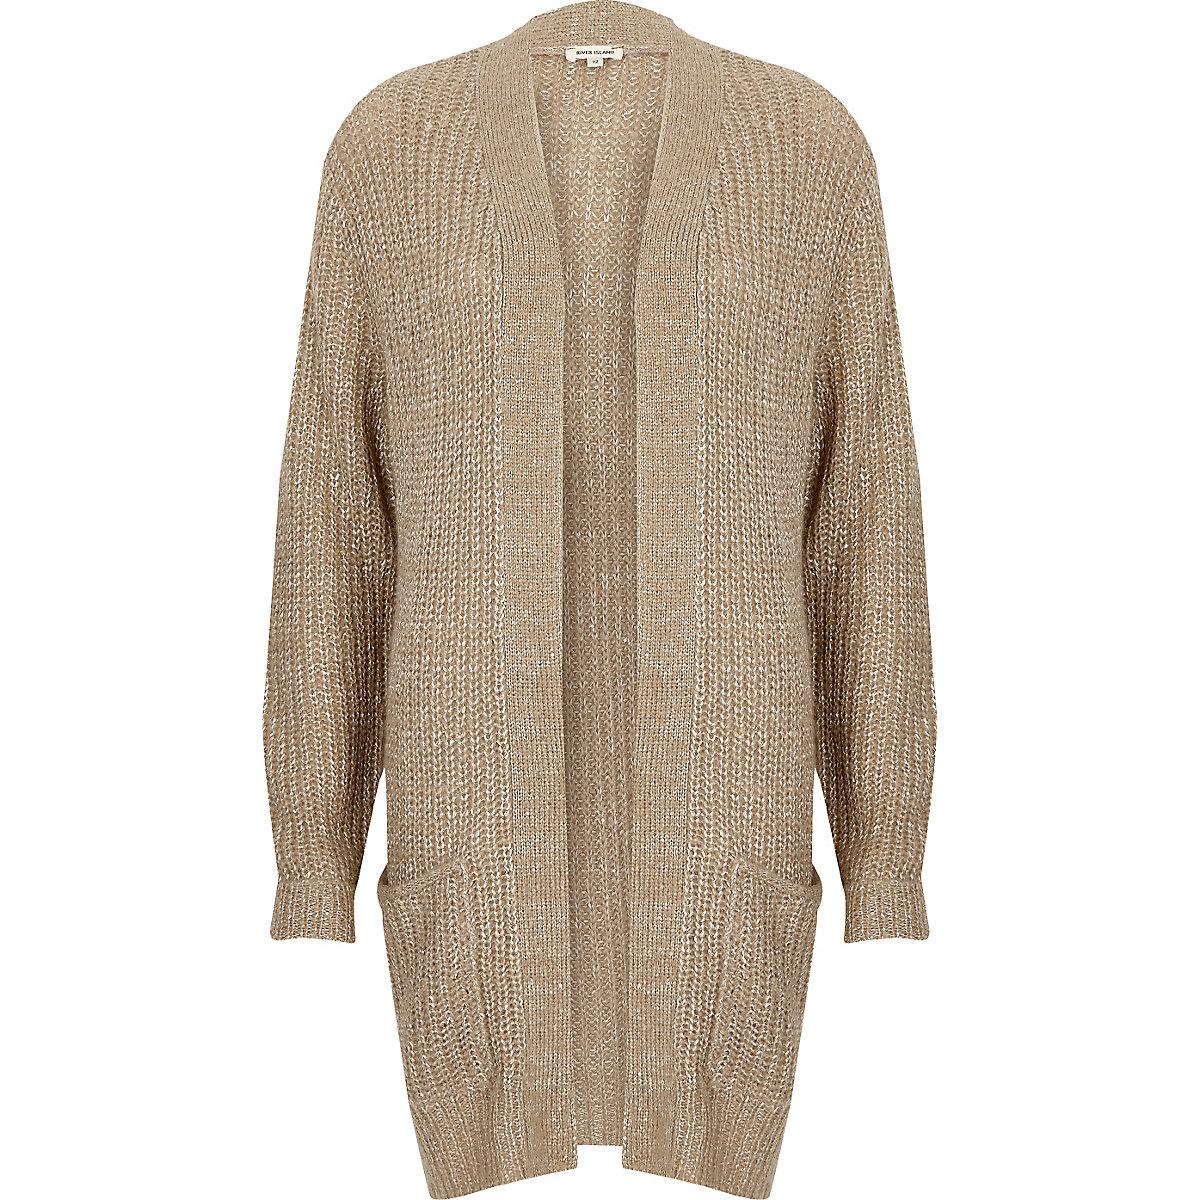 Beige knit sequin cardigan